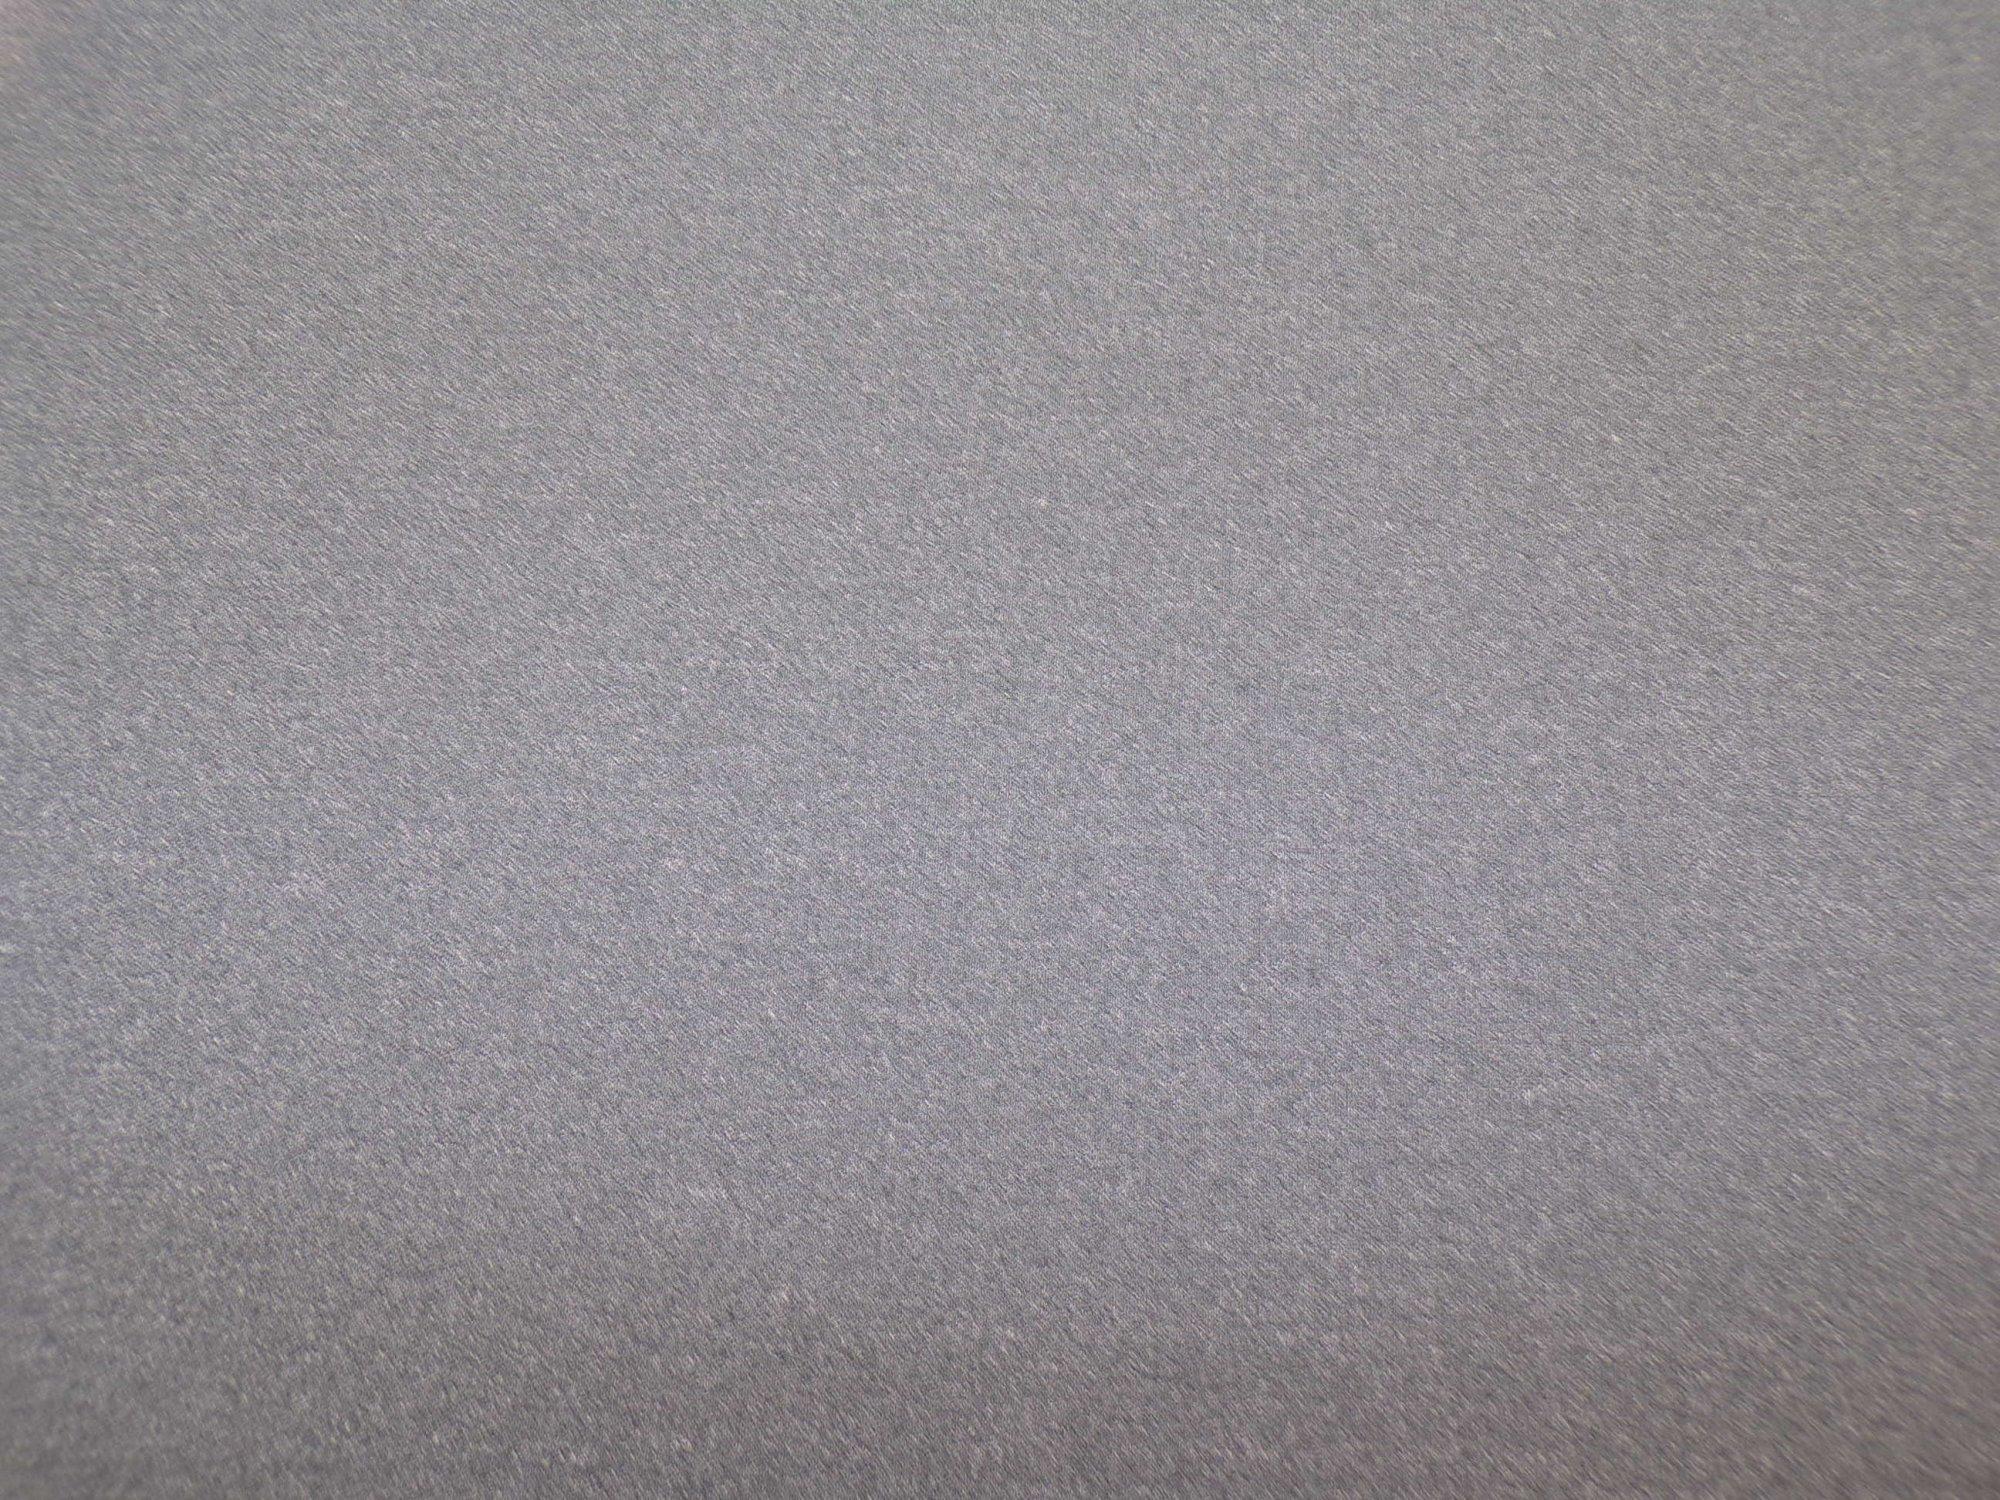 Ponte (Scuba) Knit - Stone Gray